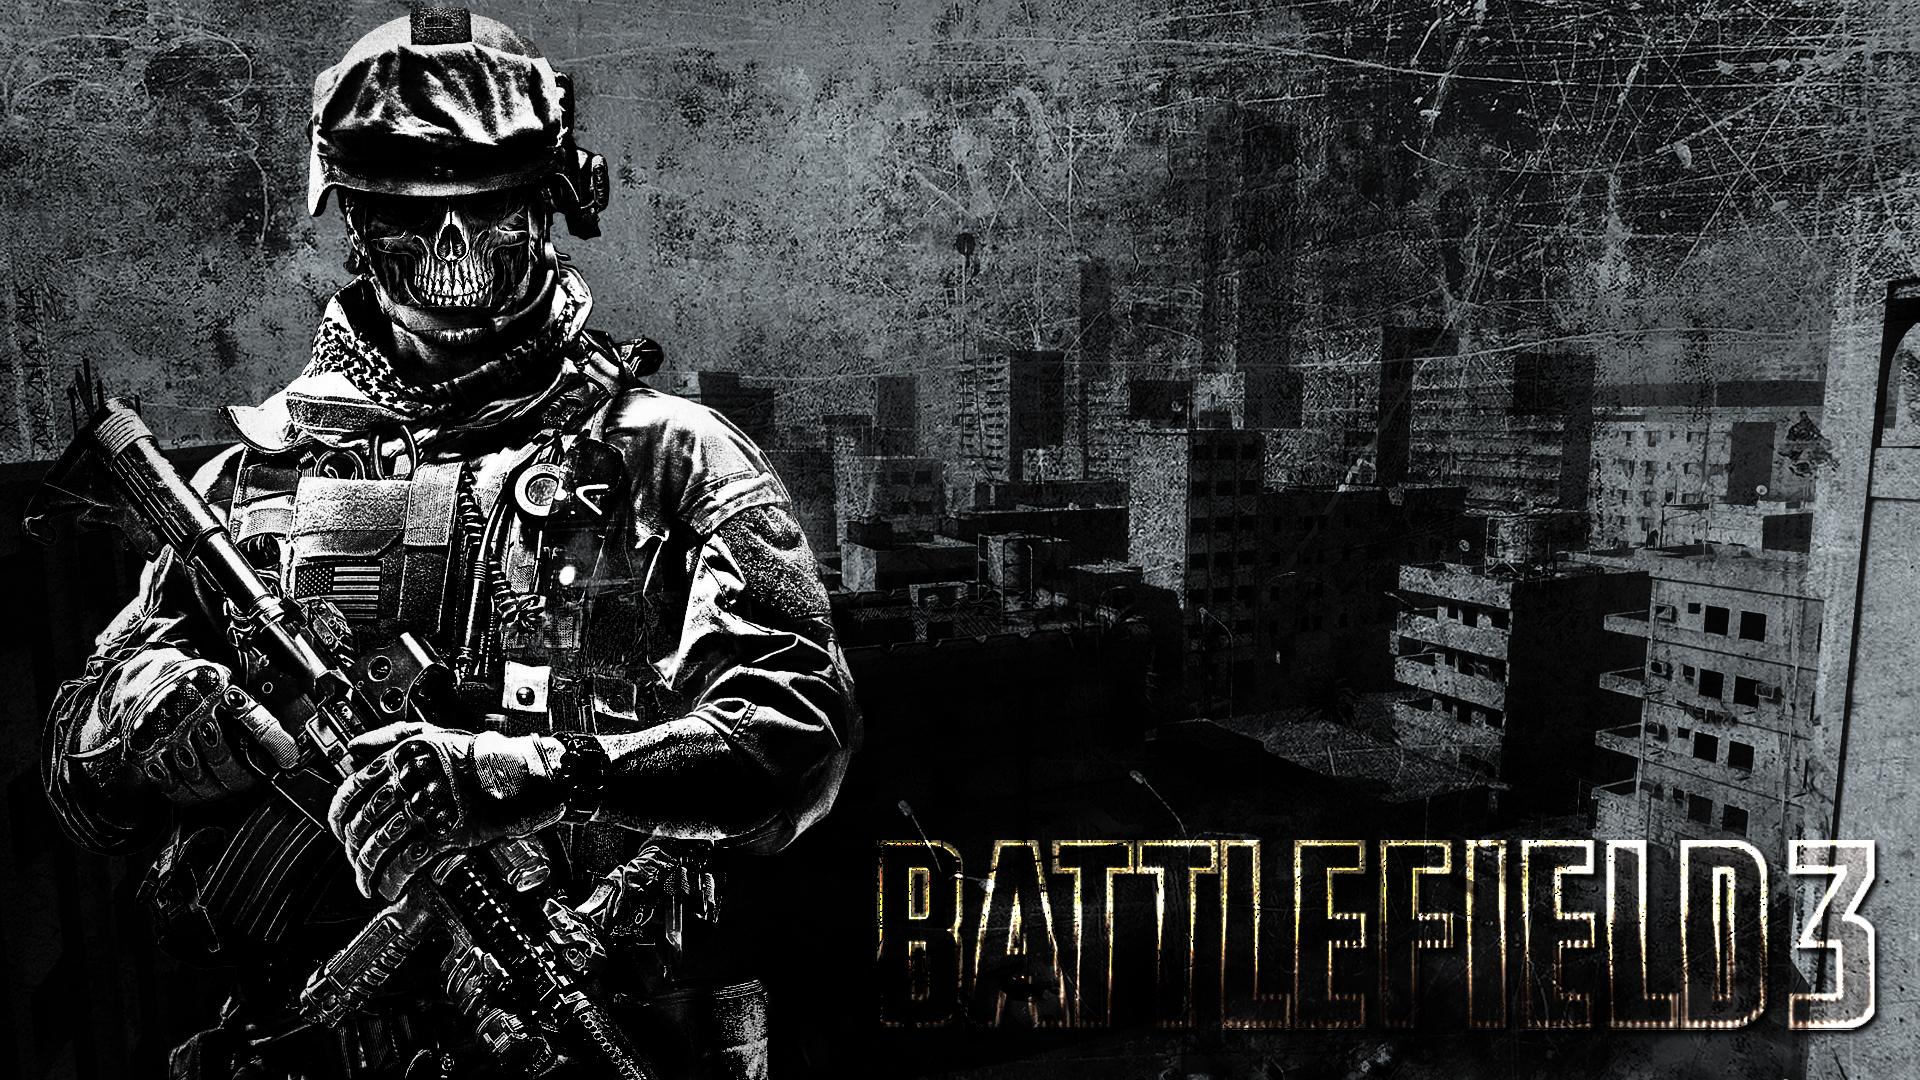 Battlefield 3 HD Wallpaper by freiheitskampfer 1920x1080